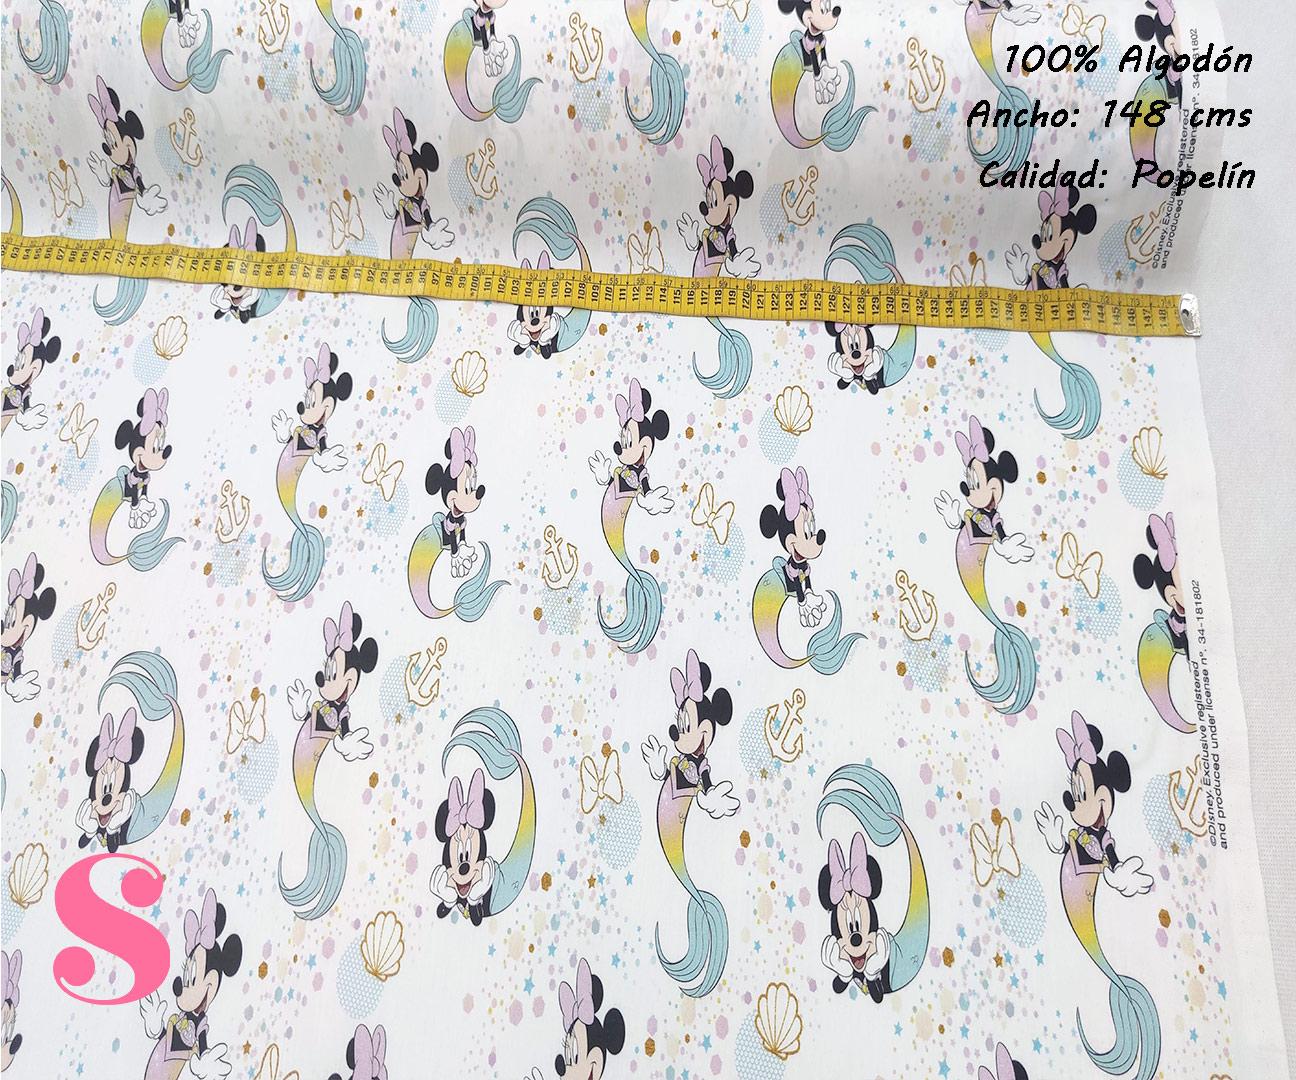 411-minnie-mouse-sirena-disney-tejidos-estampados-popelin,telas infantiles,telas disney,Popelín Estampado Minnie Sirena